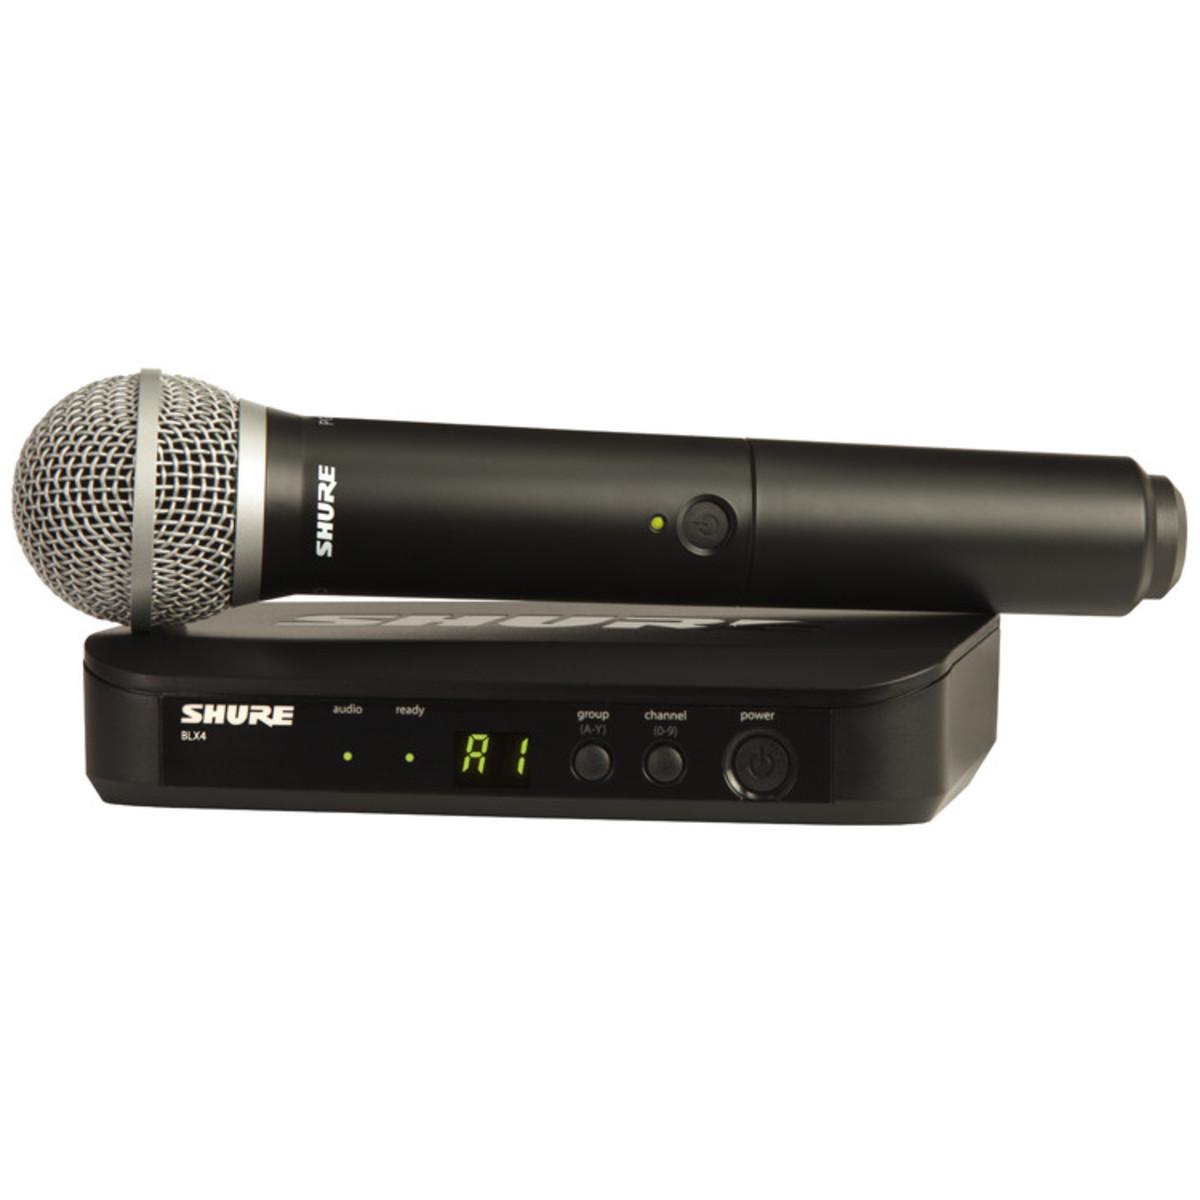 shure blx24uk pg58 handheld wireless microphone system ex demo at gear4music. Black Bedroom Furniture Sets. Home Design Ideas